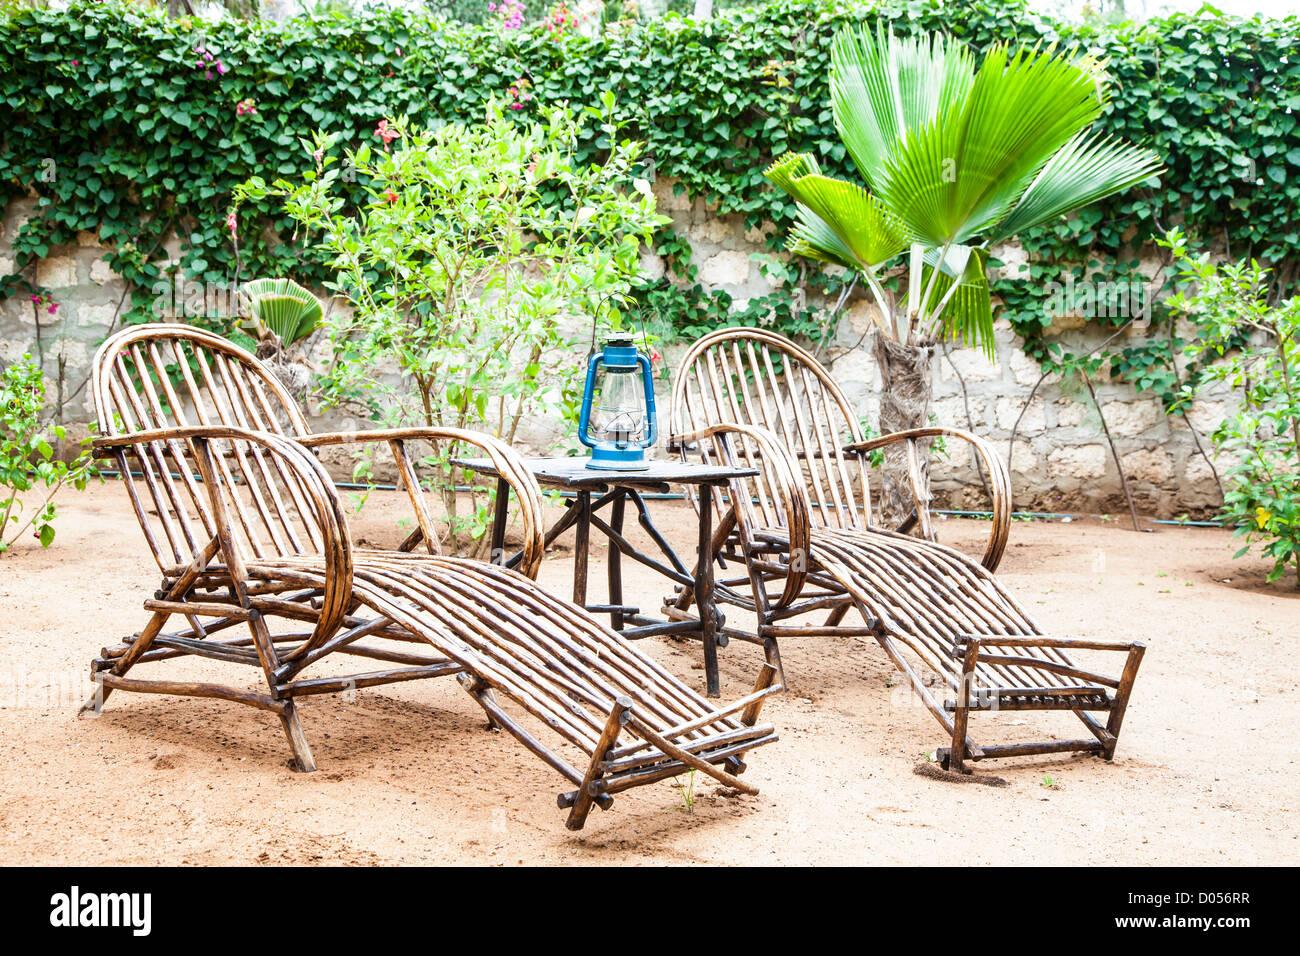 African Garden Furniture Kenya elegant furniture made of wood in an african garden stock elegant furniture made of wood in an african garden workwithnaturefo